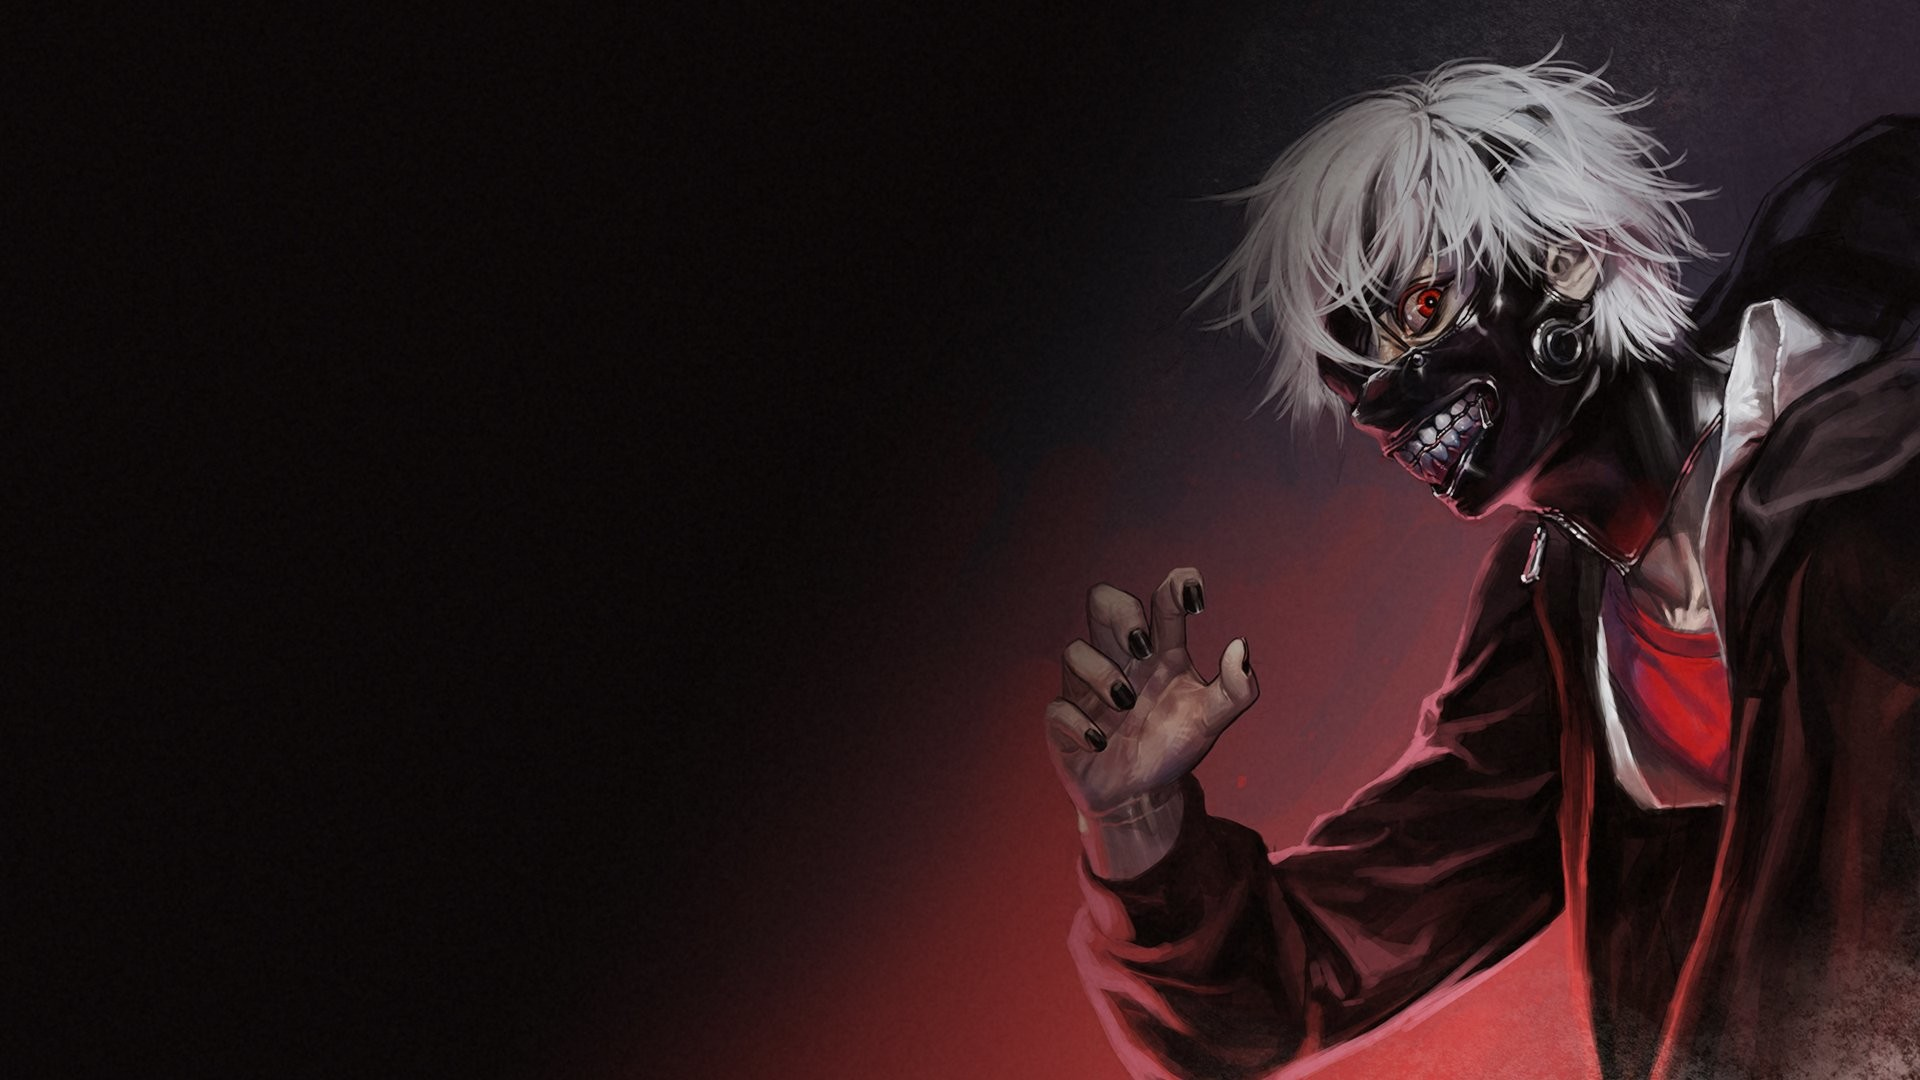 … Tokyo Ghoul Touka Kirishima Uta · HD Duvar kağıdı | Arka plan ID:545916